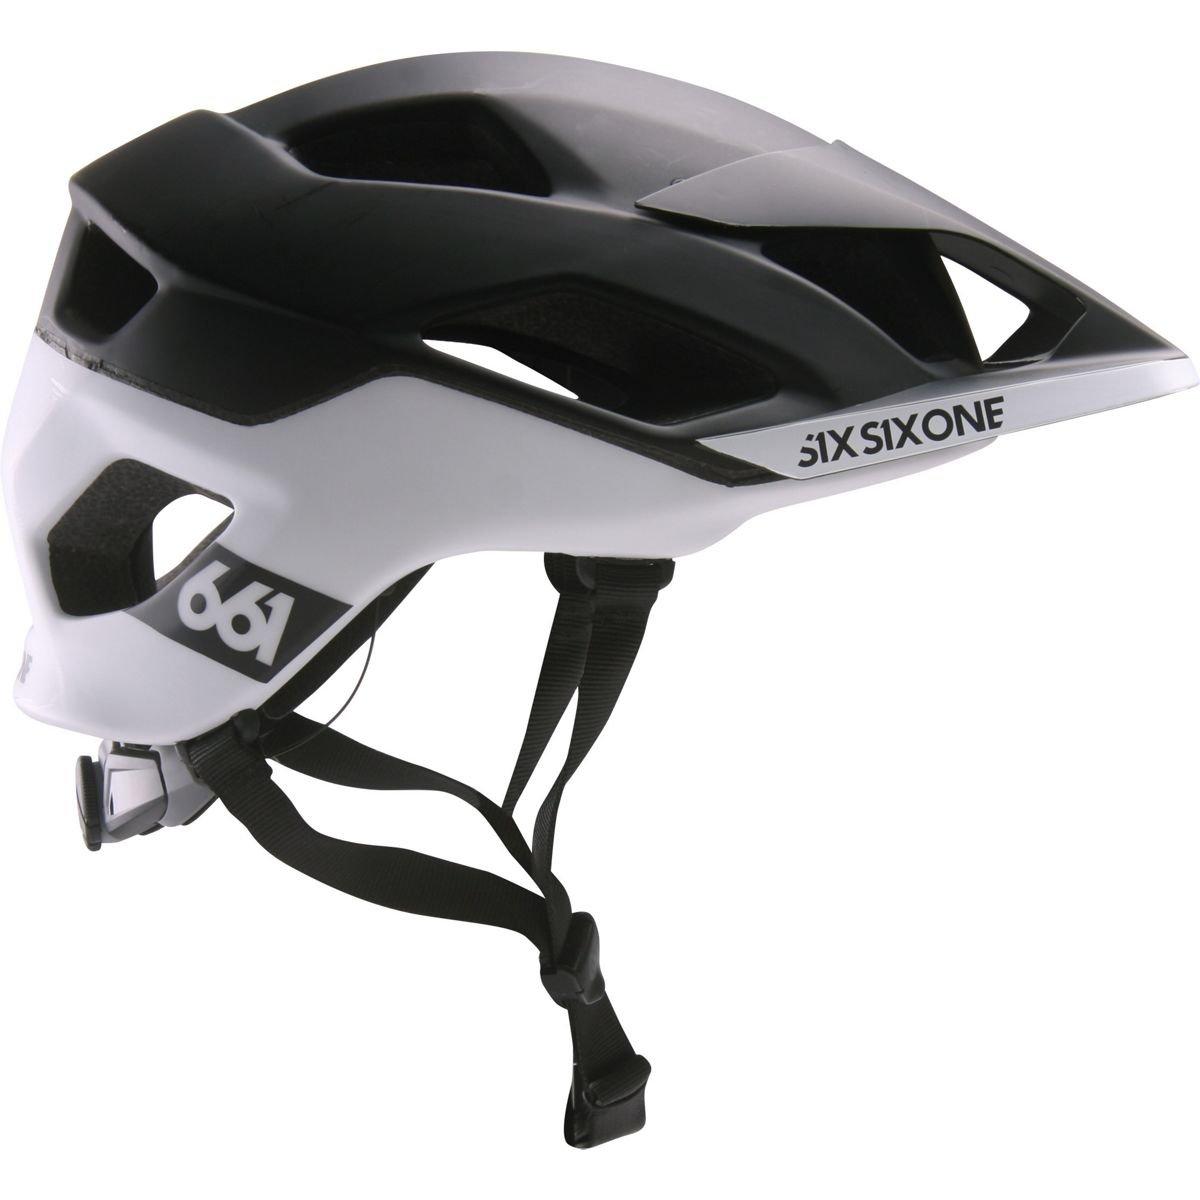 Sixsixone Evo AM Patrol Casco, Black/White, XL de XXL